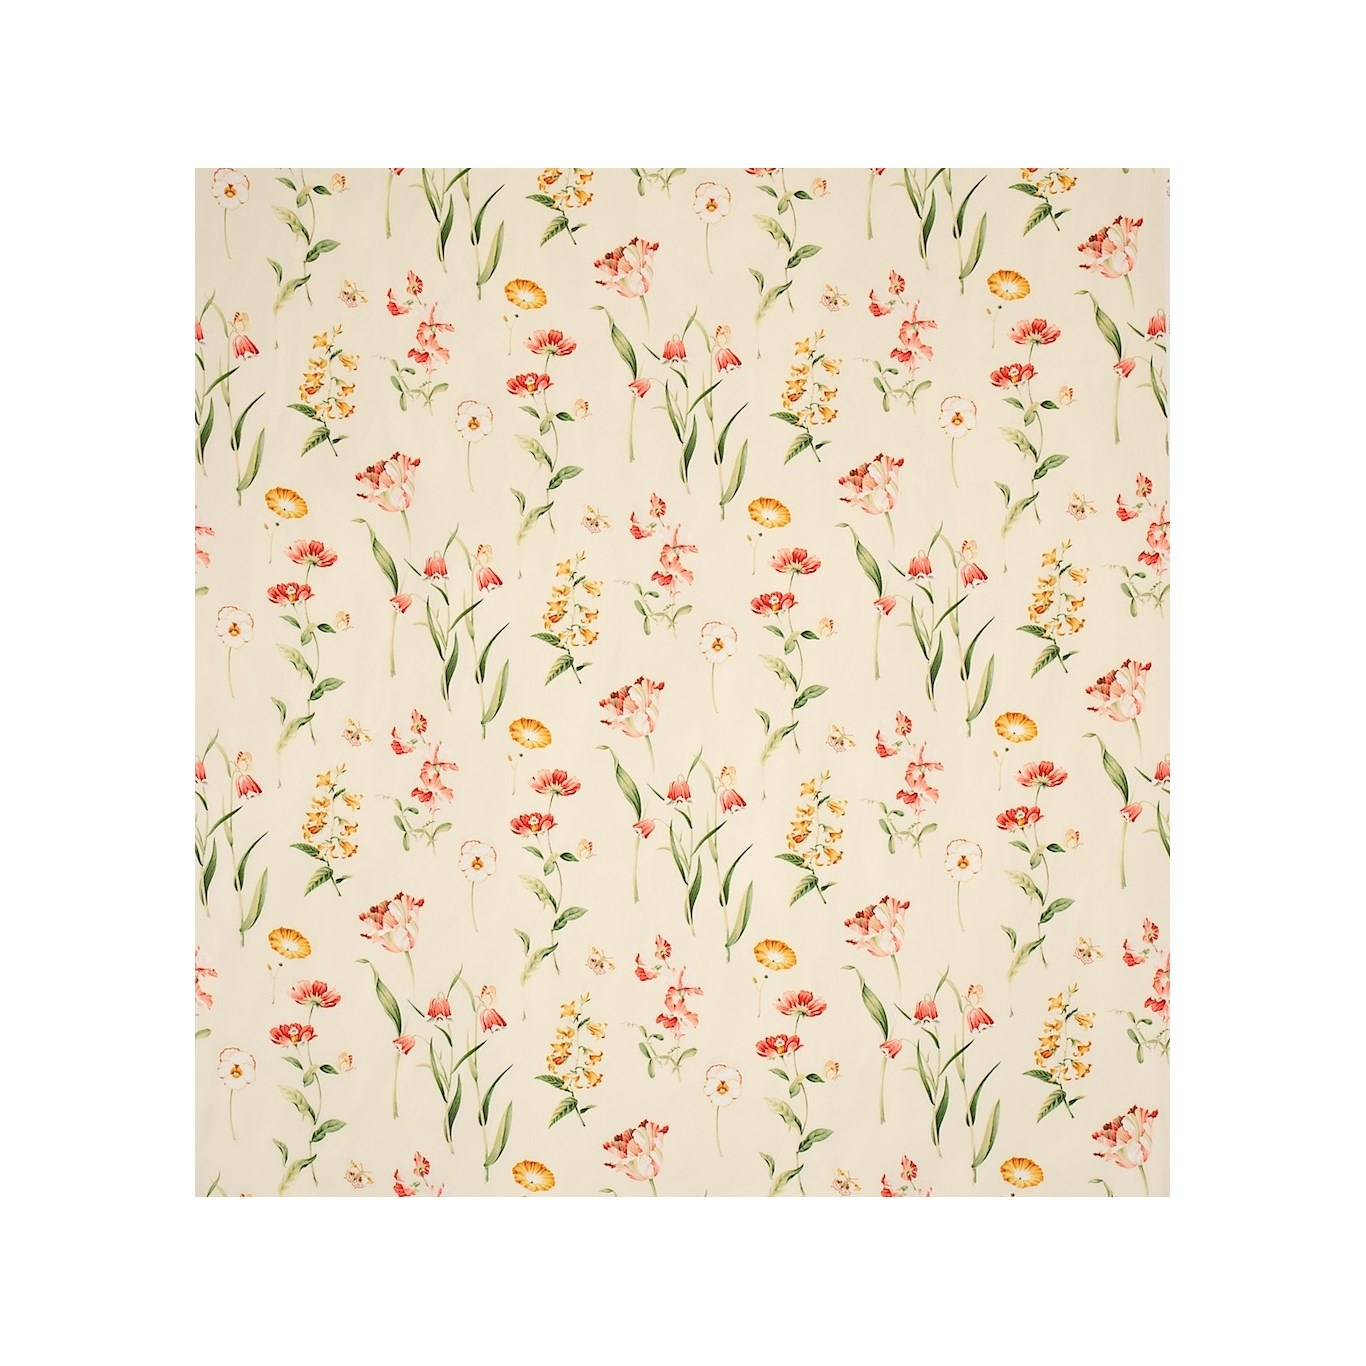 Image of Sanderson Butterfly Garden Curtain Fabric PR8626/4